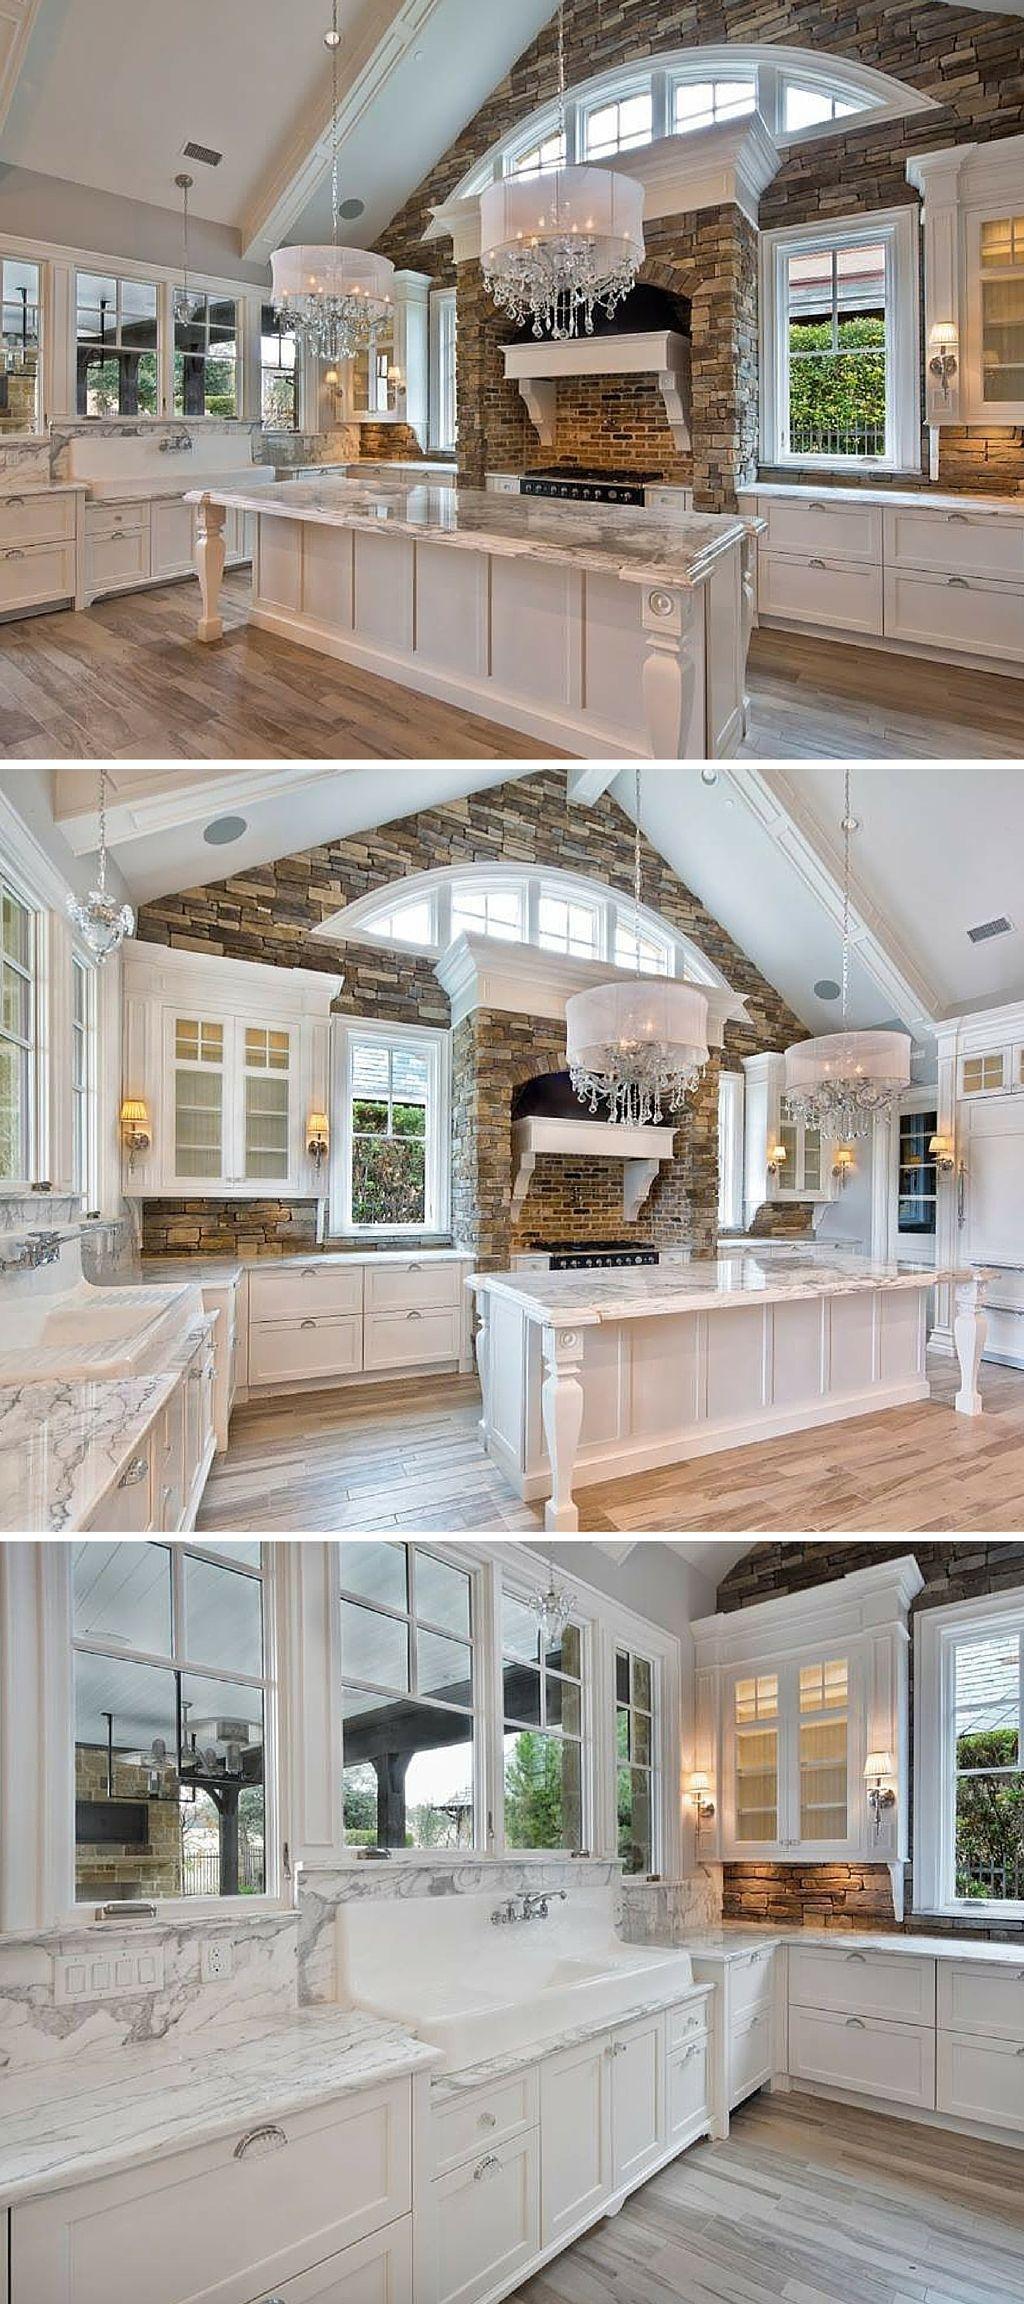 Wood Mode Cabinets Houston Texas Beautiful Kitchens Dream House House